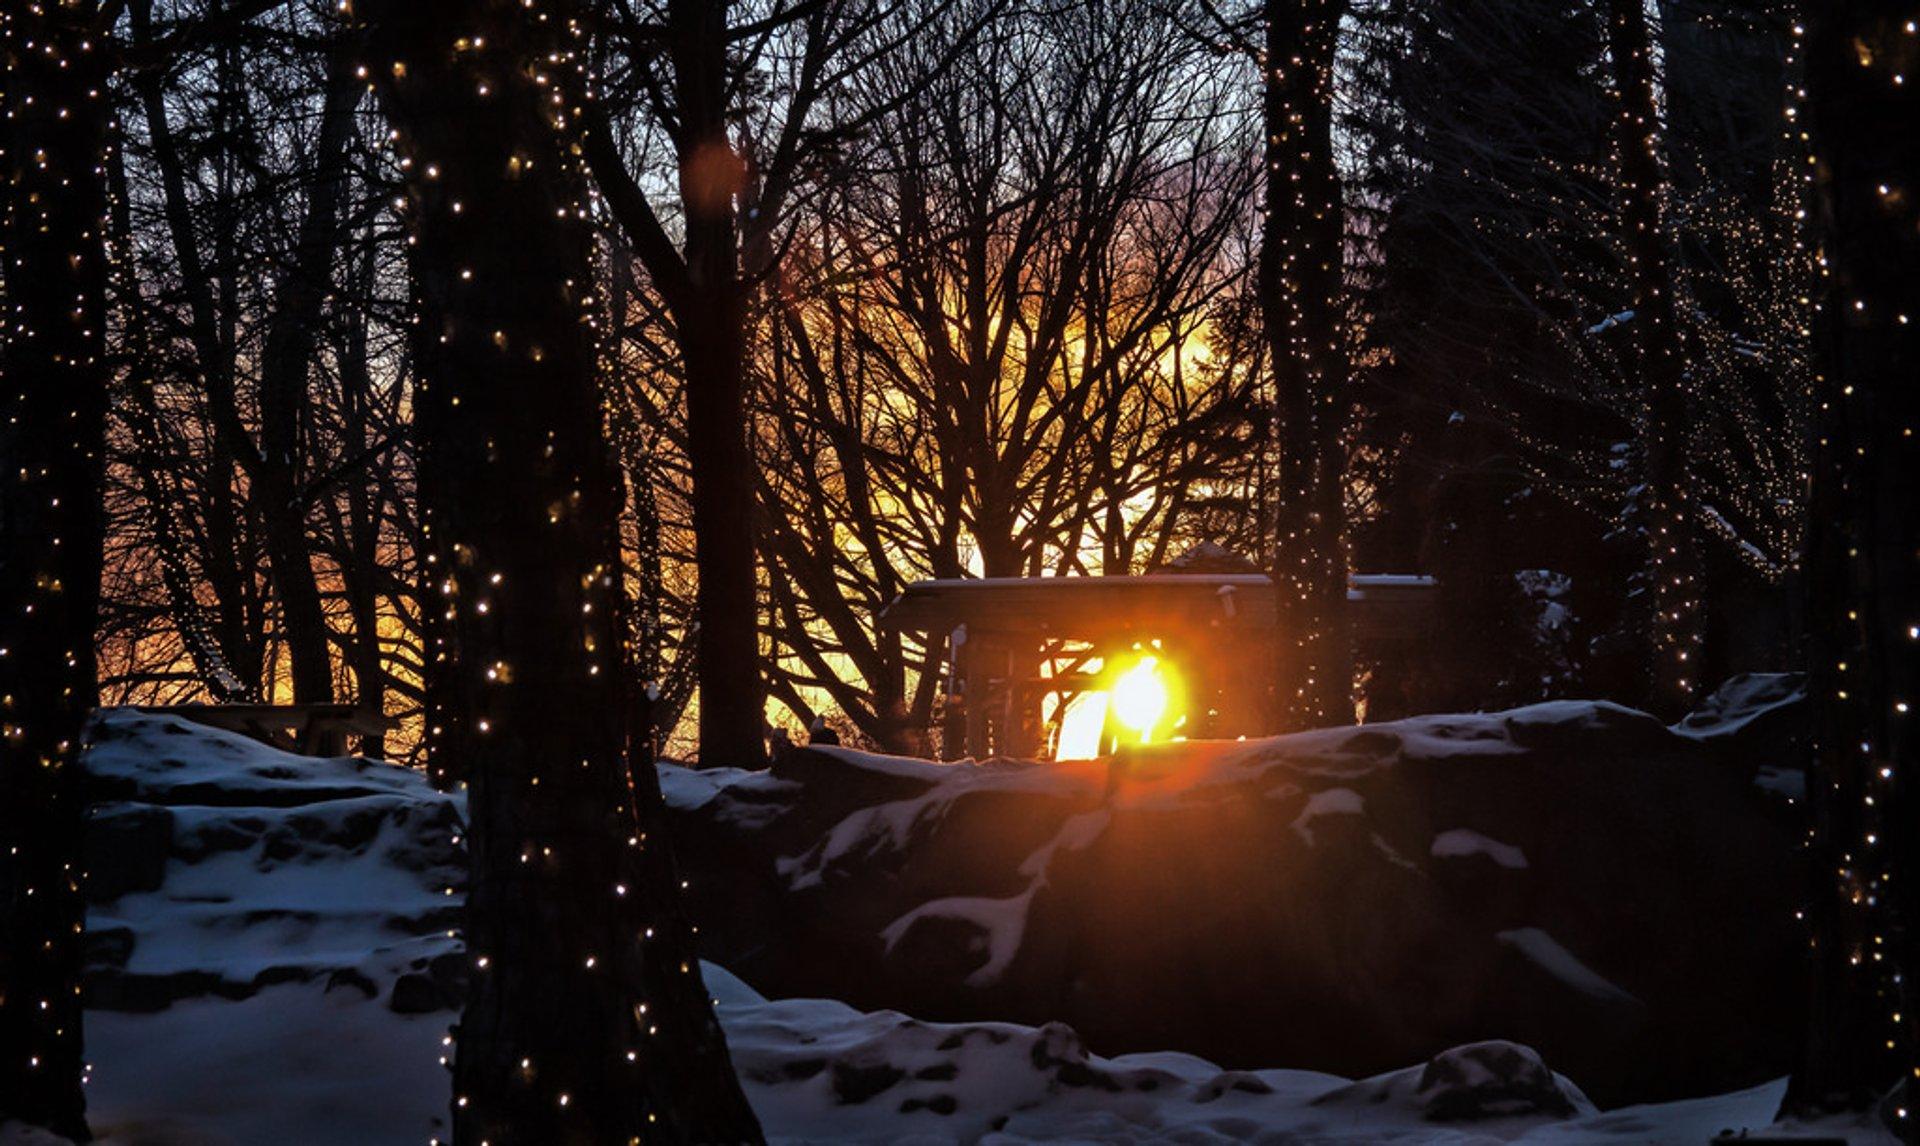 Winter Light Exhibition in Toronto - Best Season 2020